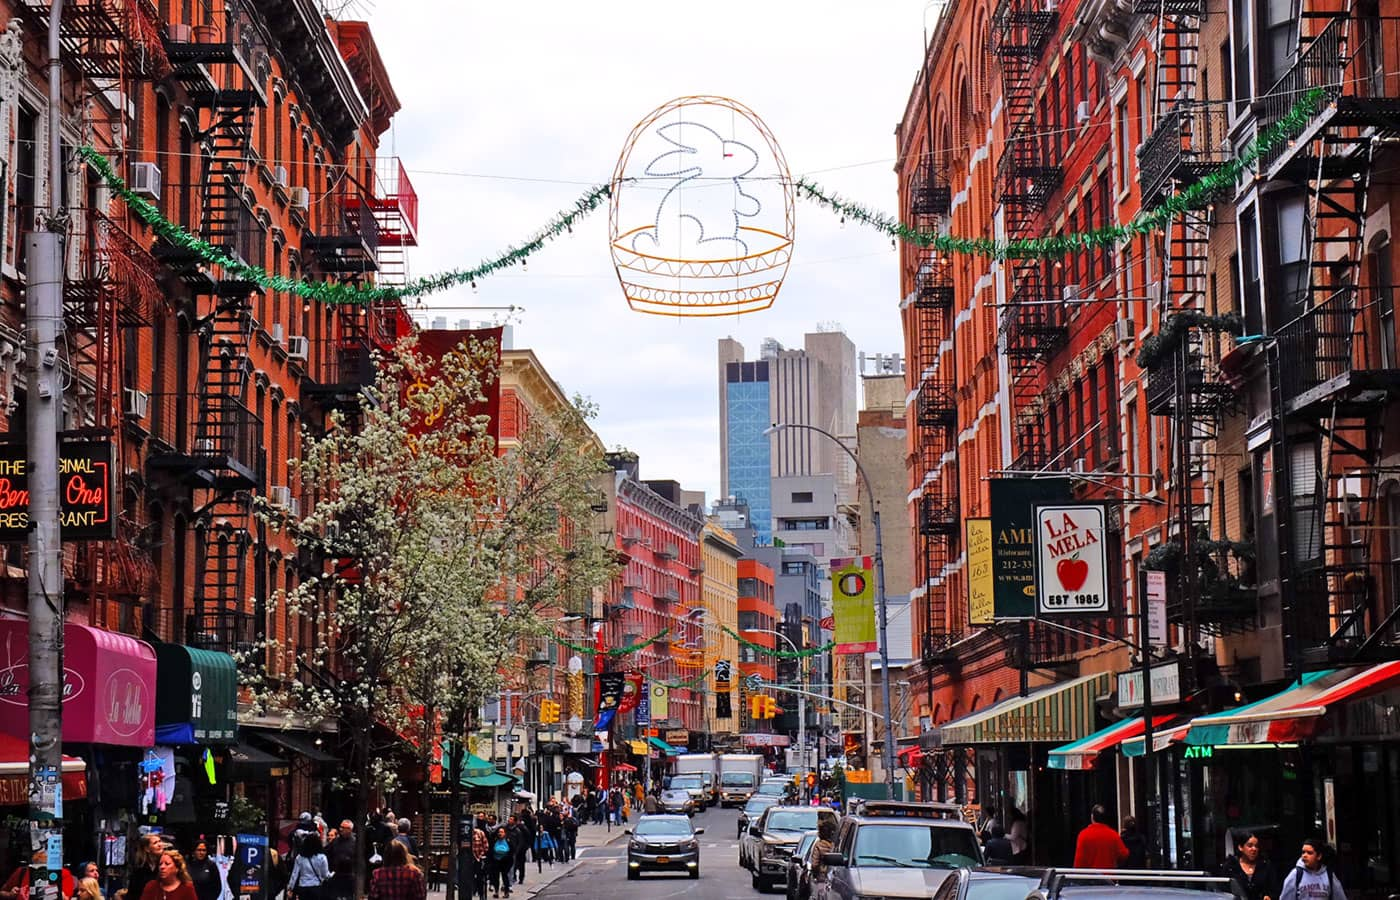 Easter in New York - Little Italy